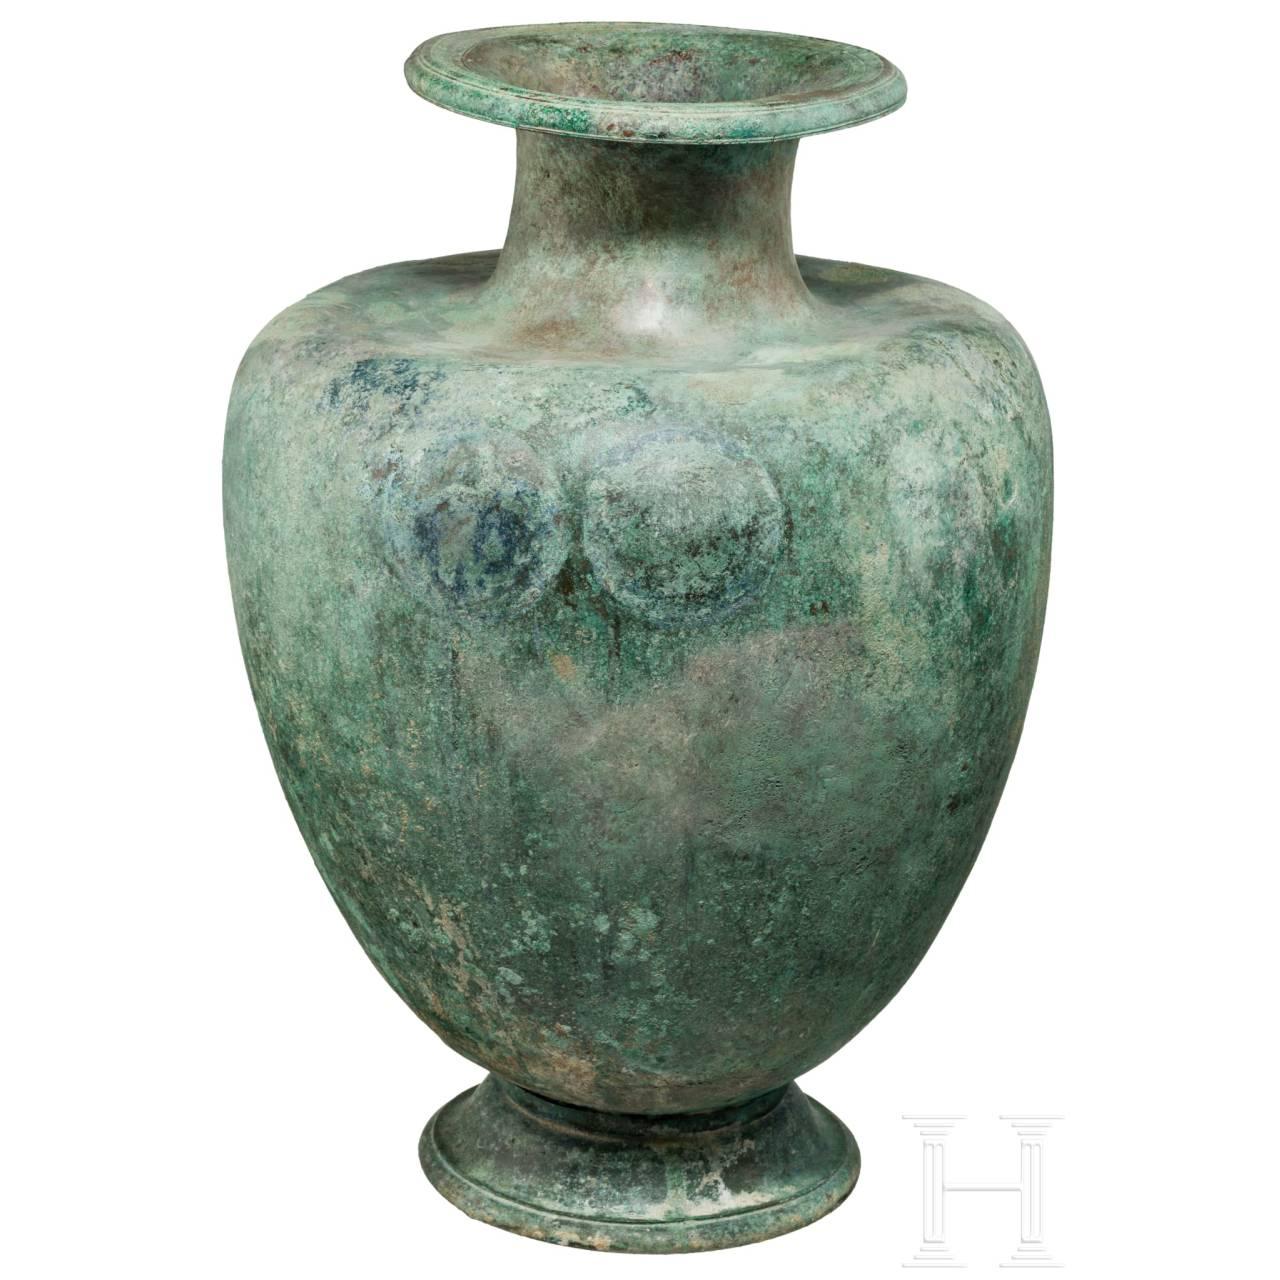 Bronzene Hydria, Griechenland, Klassik, 5. Jhdt. v. Chr.